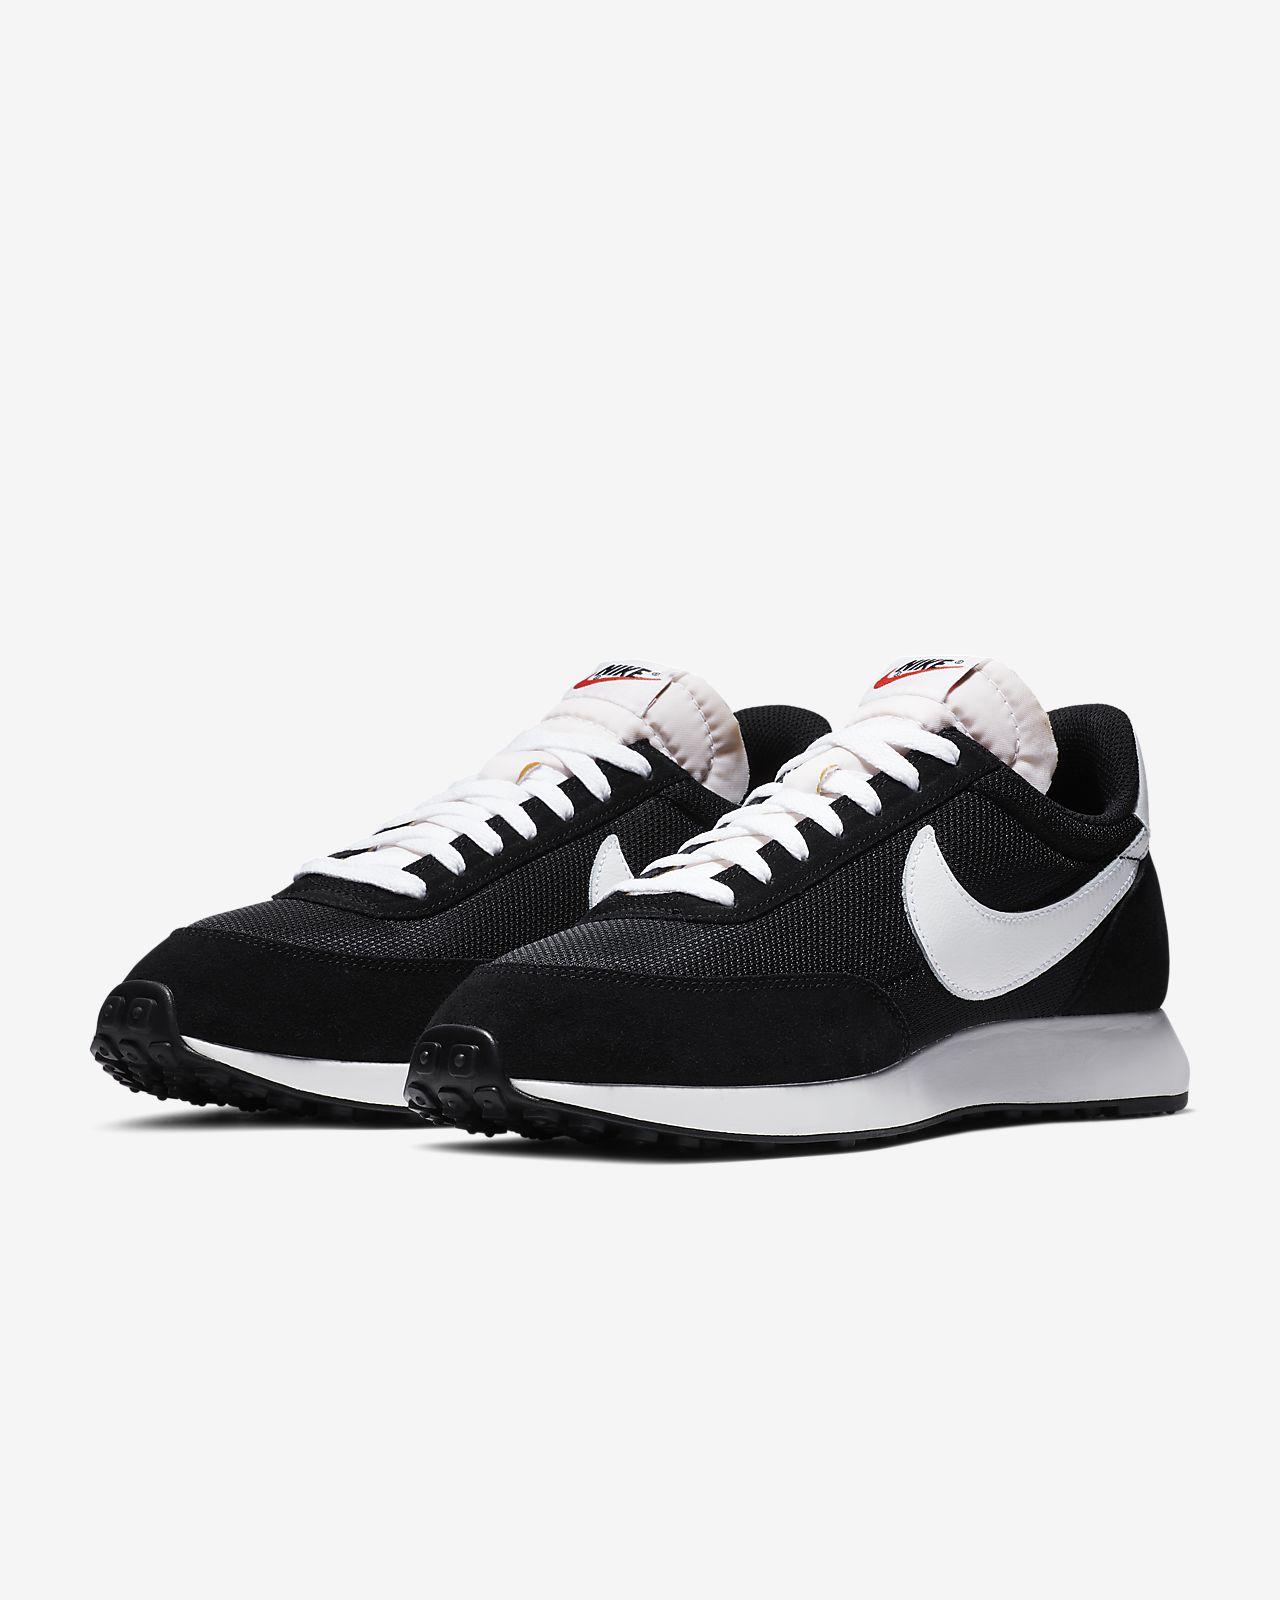 f2b287561c Nike Air Tailwind 79 Men s Shoe. Nike.com GB